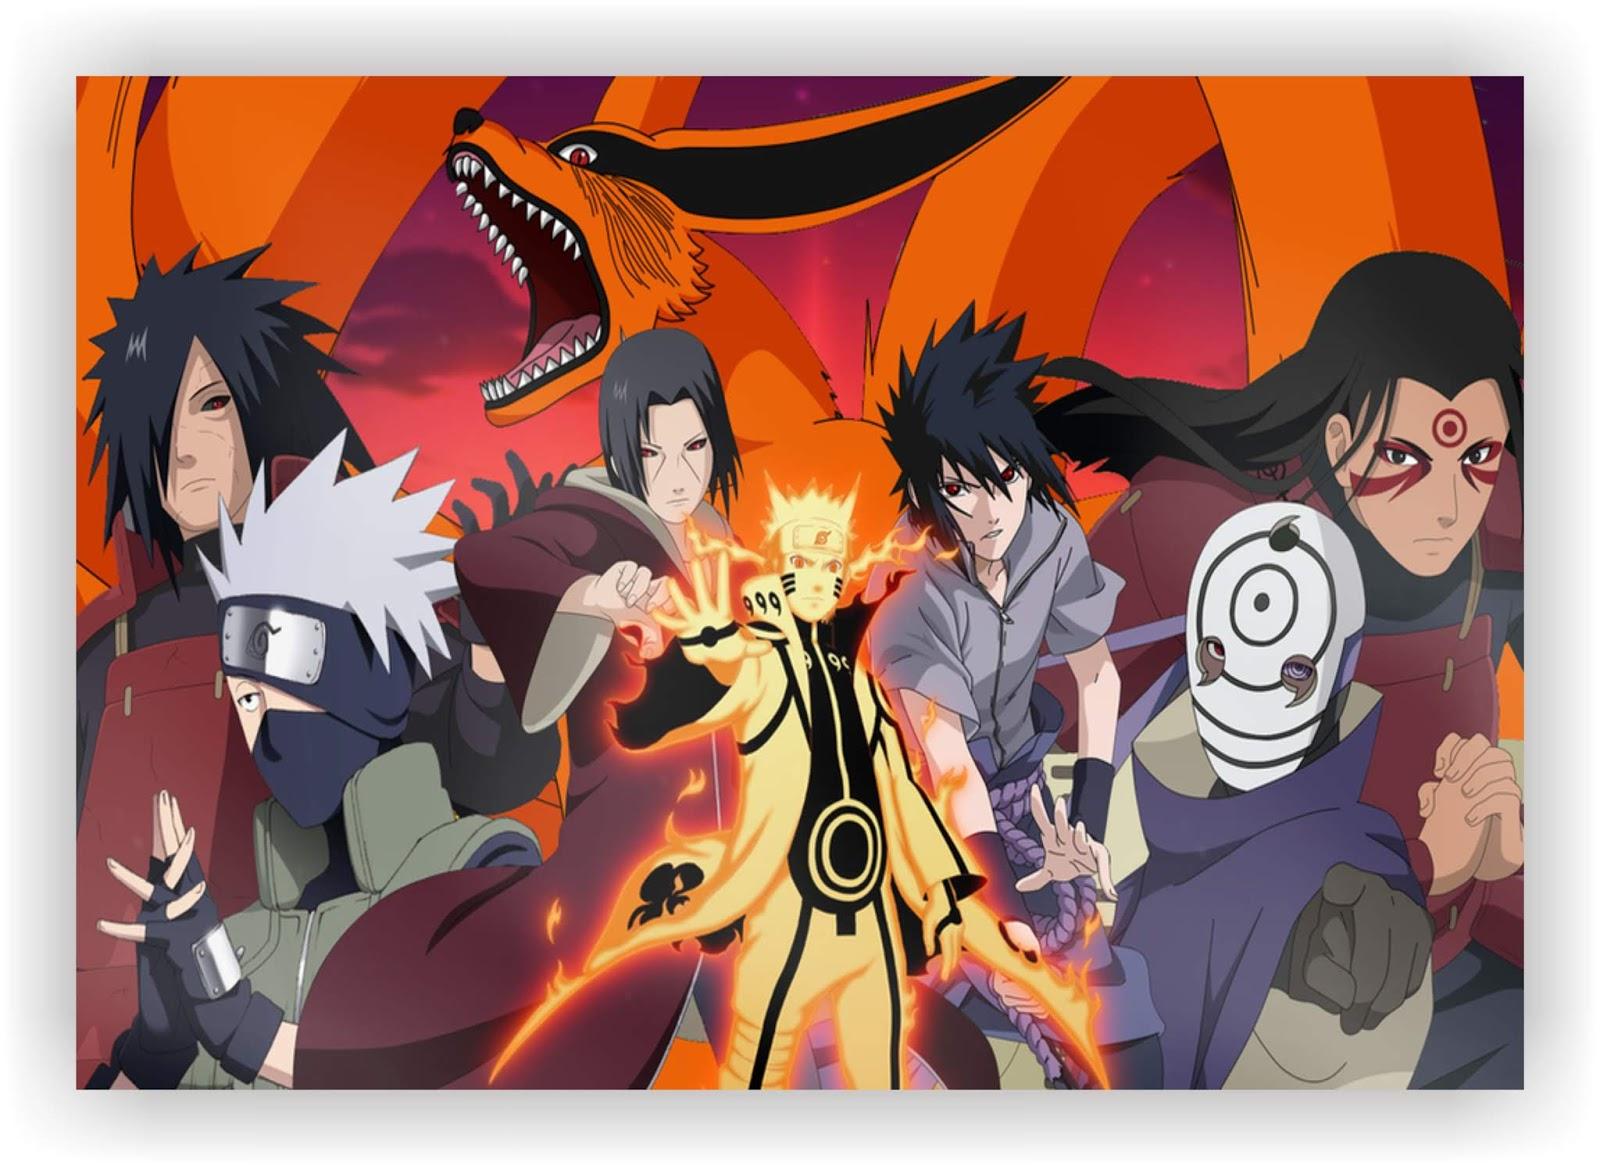 Kumpulan Kata Mutiara Dalam Film Naruto Yang Akan Menginspirasi Diri